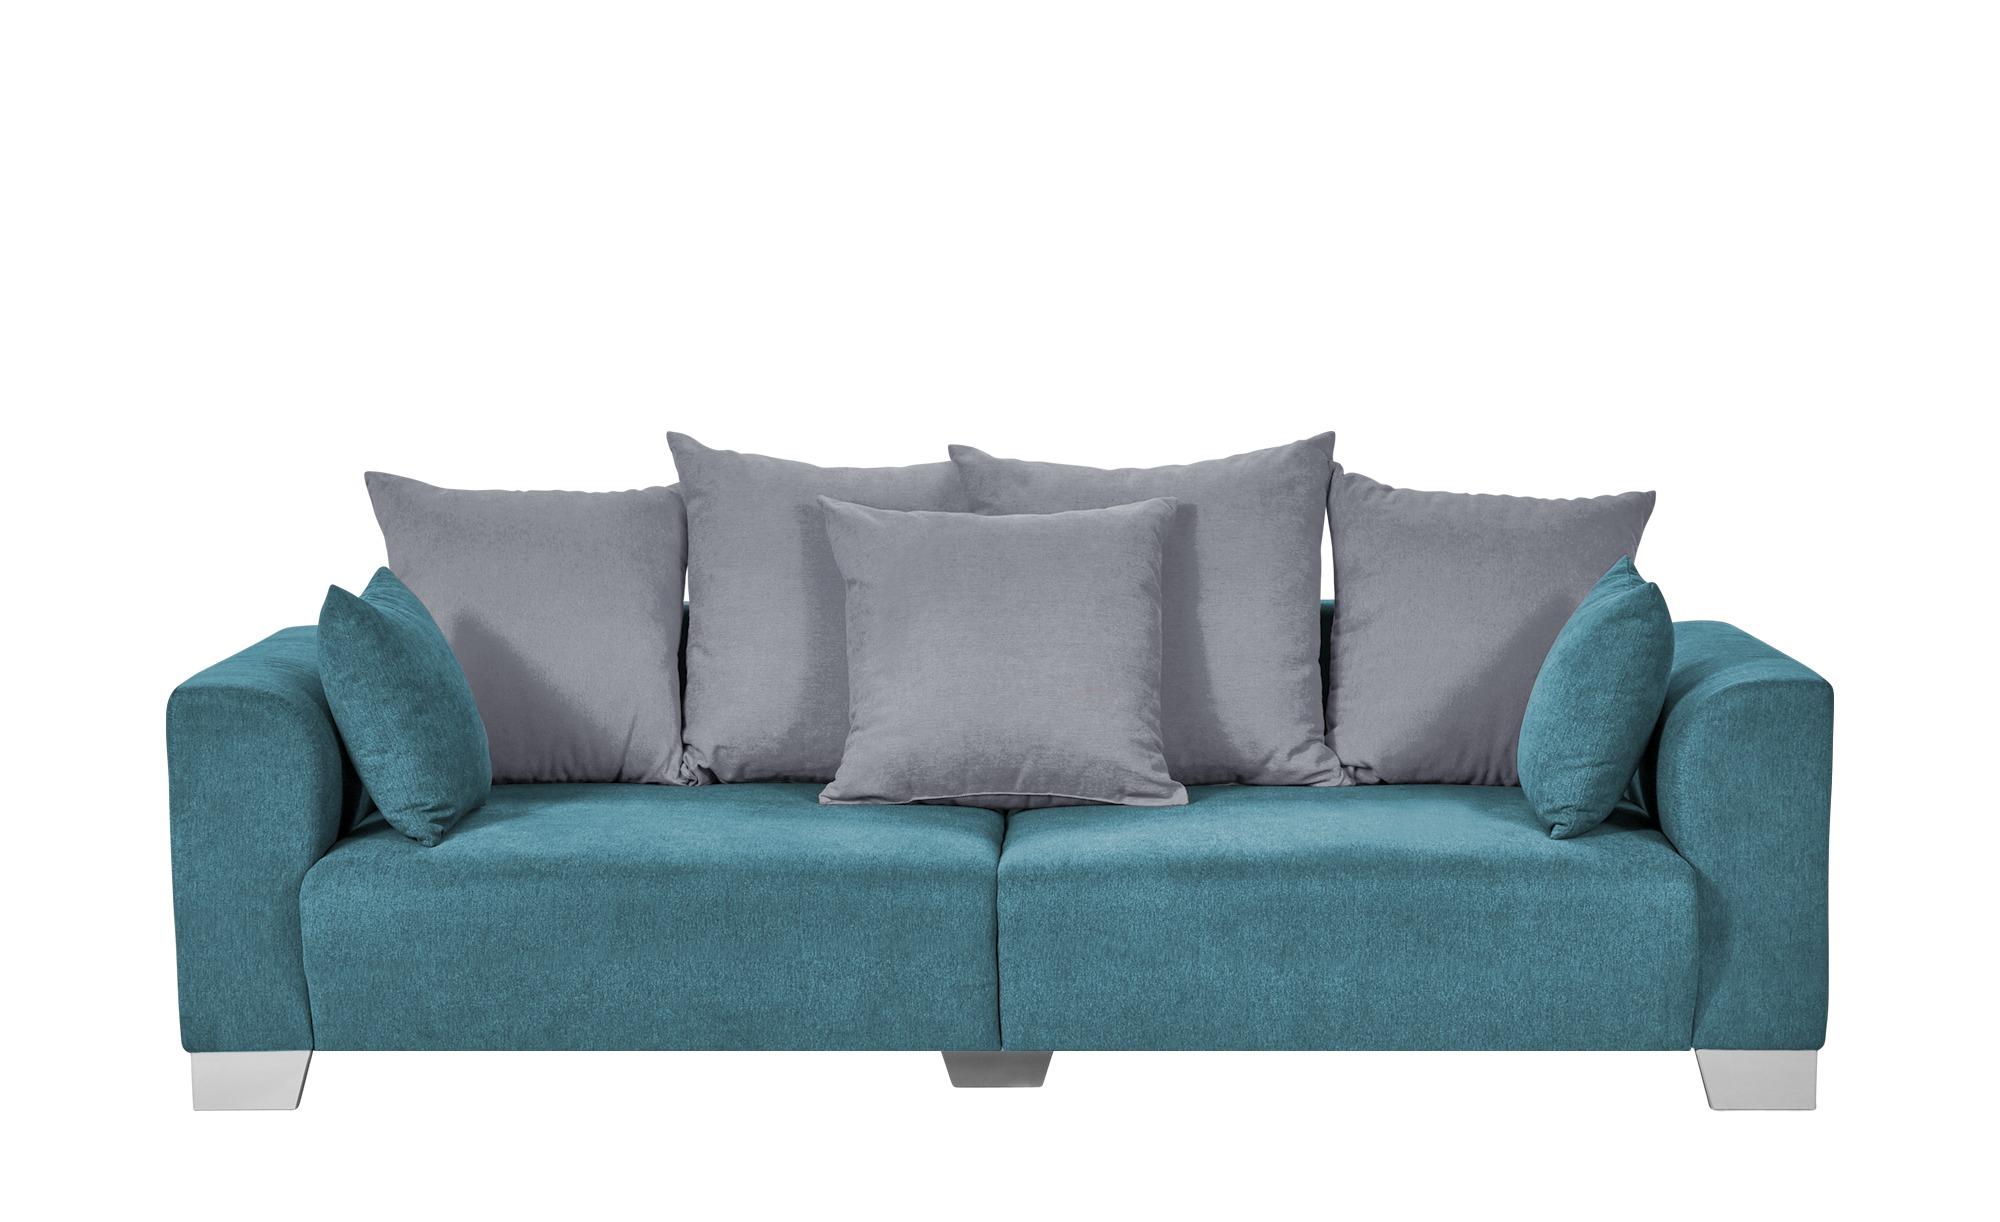 smart Big Sofa petrol - Flachgewebe Tonja ¦ türkis/petrol ¦ Maße (cm): B: 244 H: 68 T: 107 Polstermöbel > Sofas > Big-Sofas - Höffner